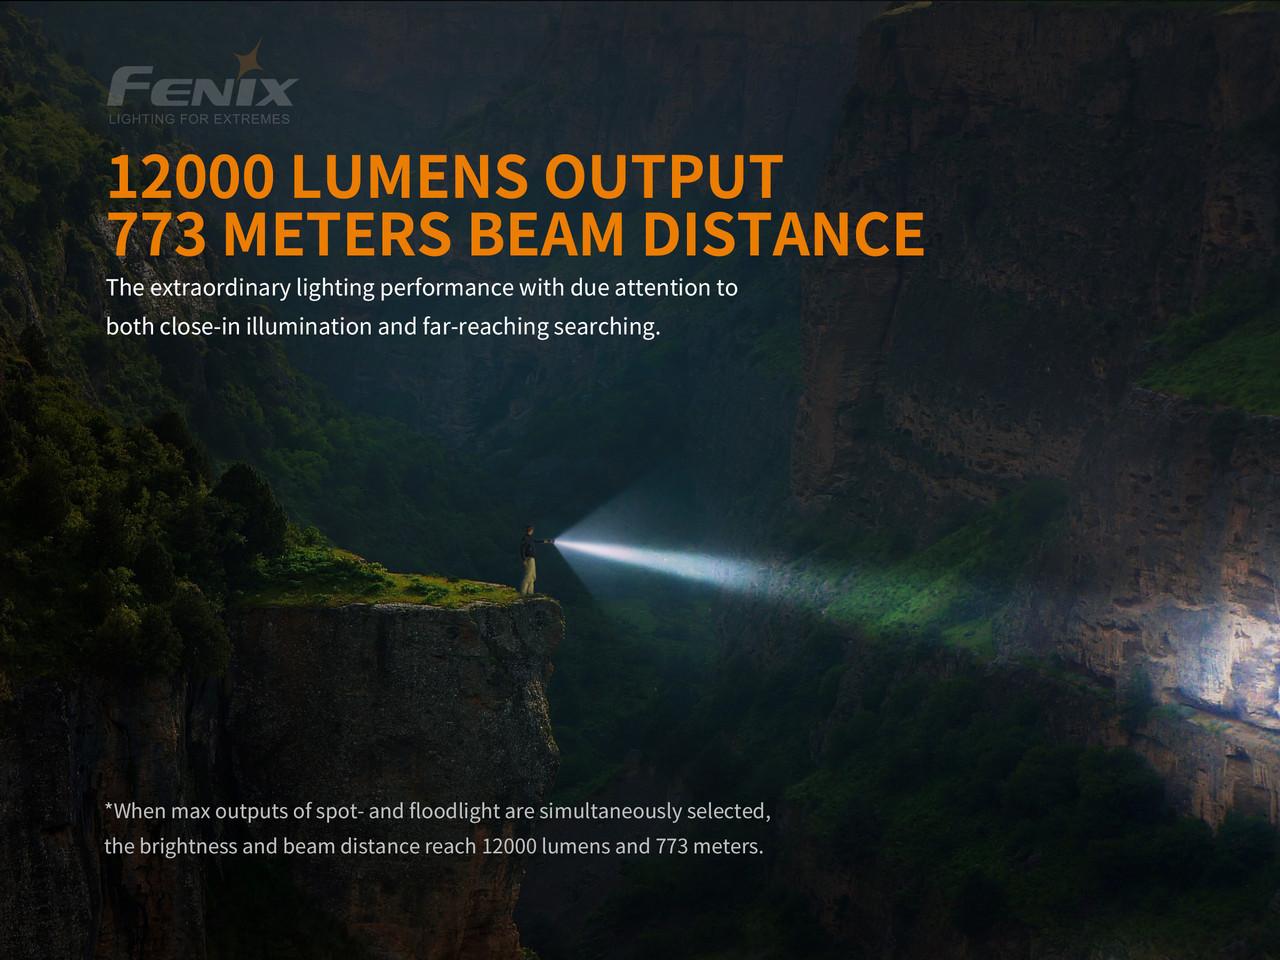 Fenix LR40R 12,000 Lumen High Performance Rechargable Search Light (LR40R)